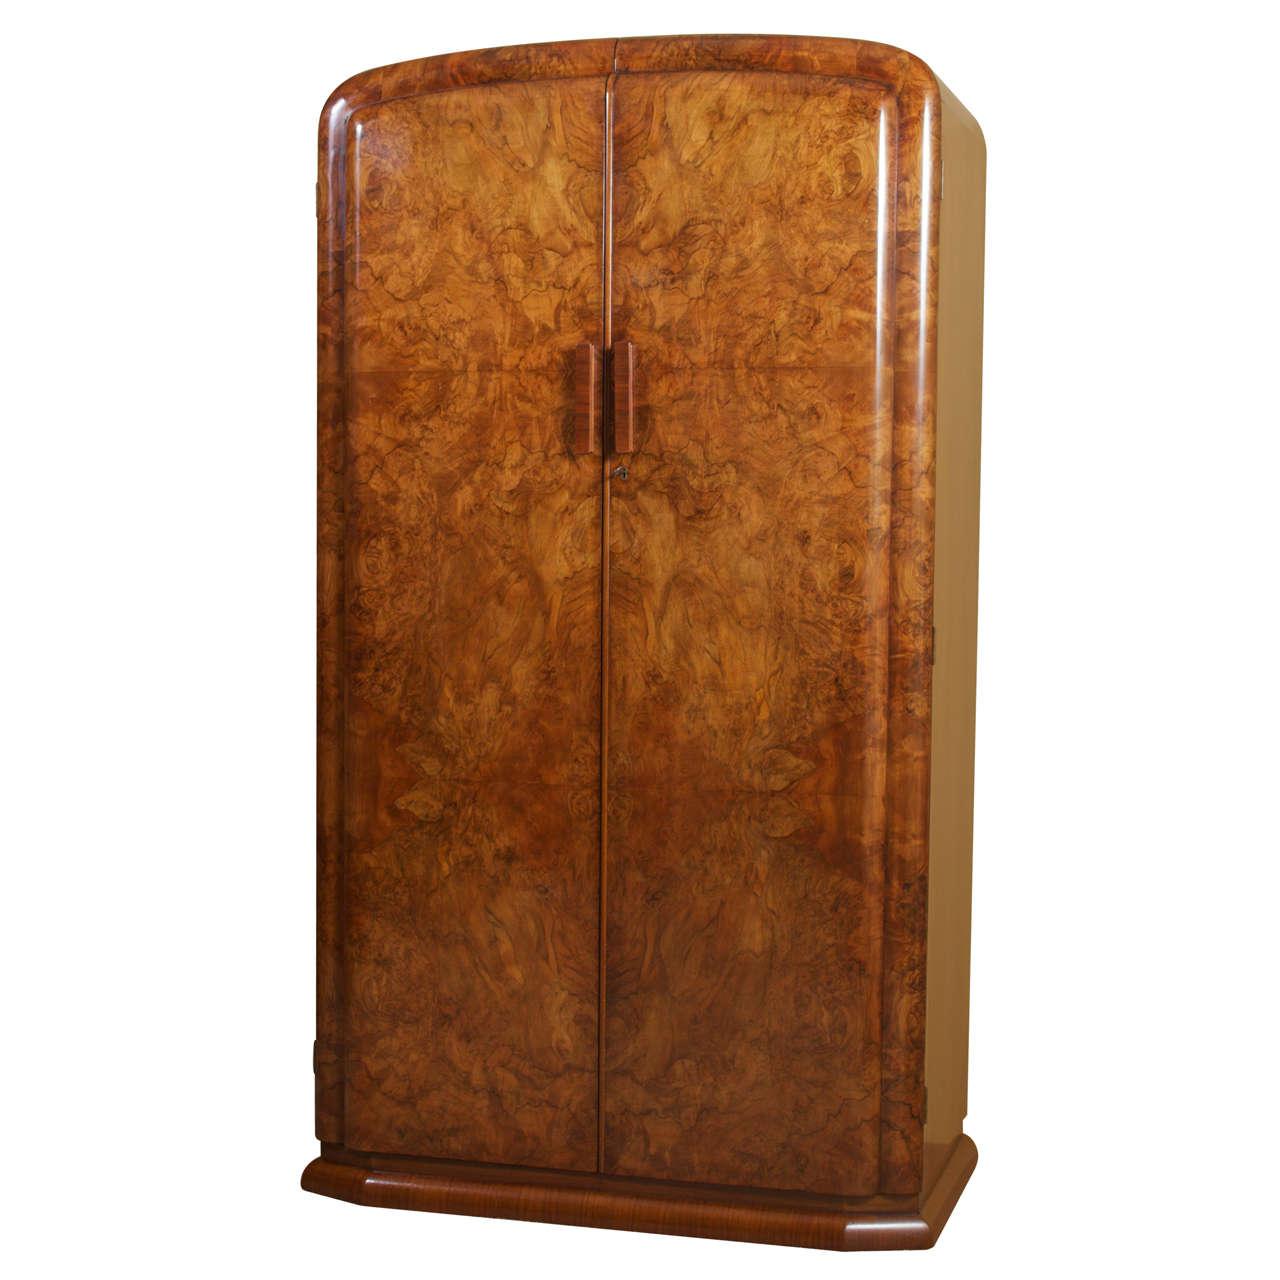 Art deco burl walnut french wardrobe or armoire at 1stdibs